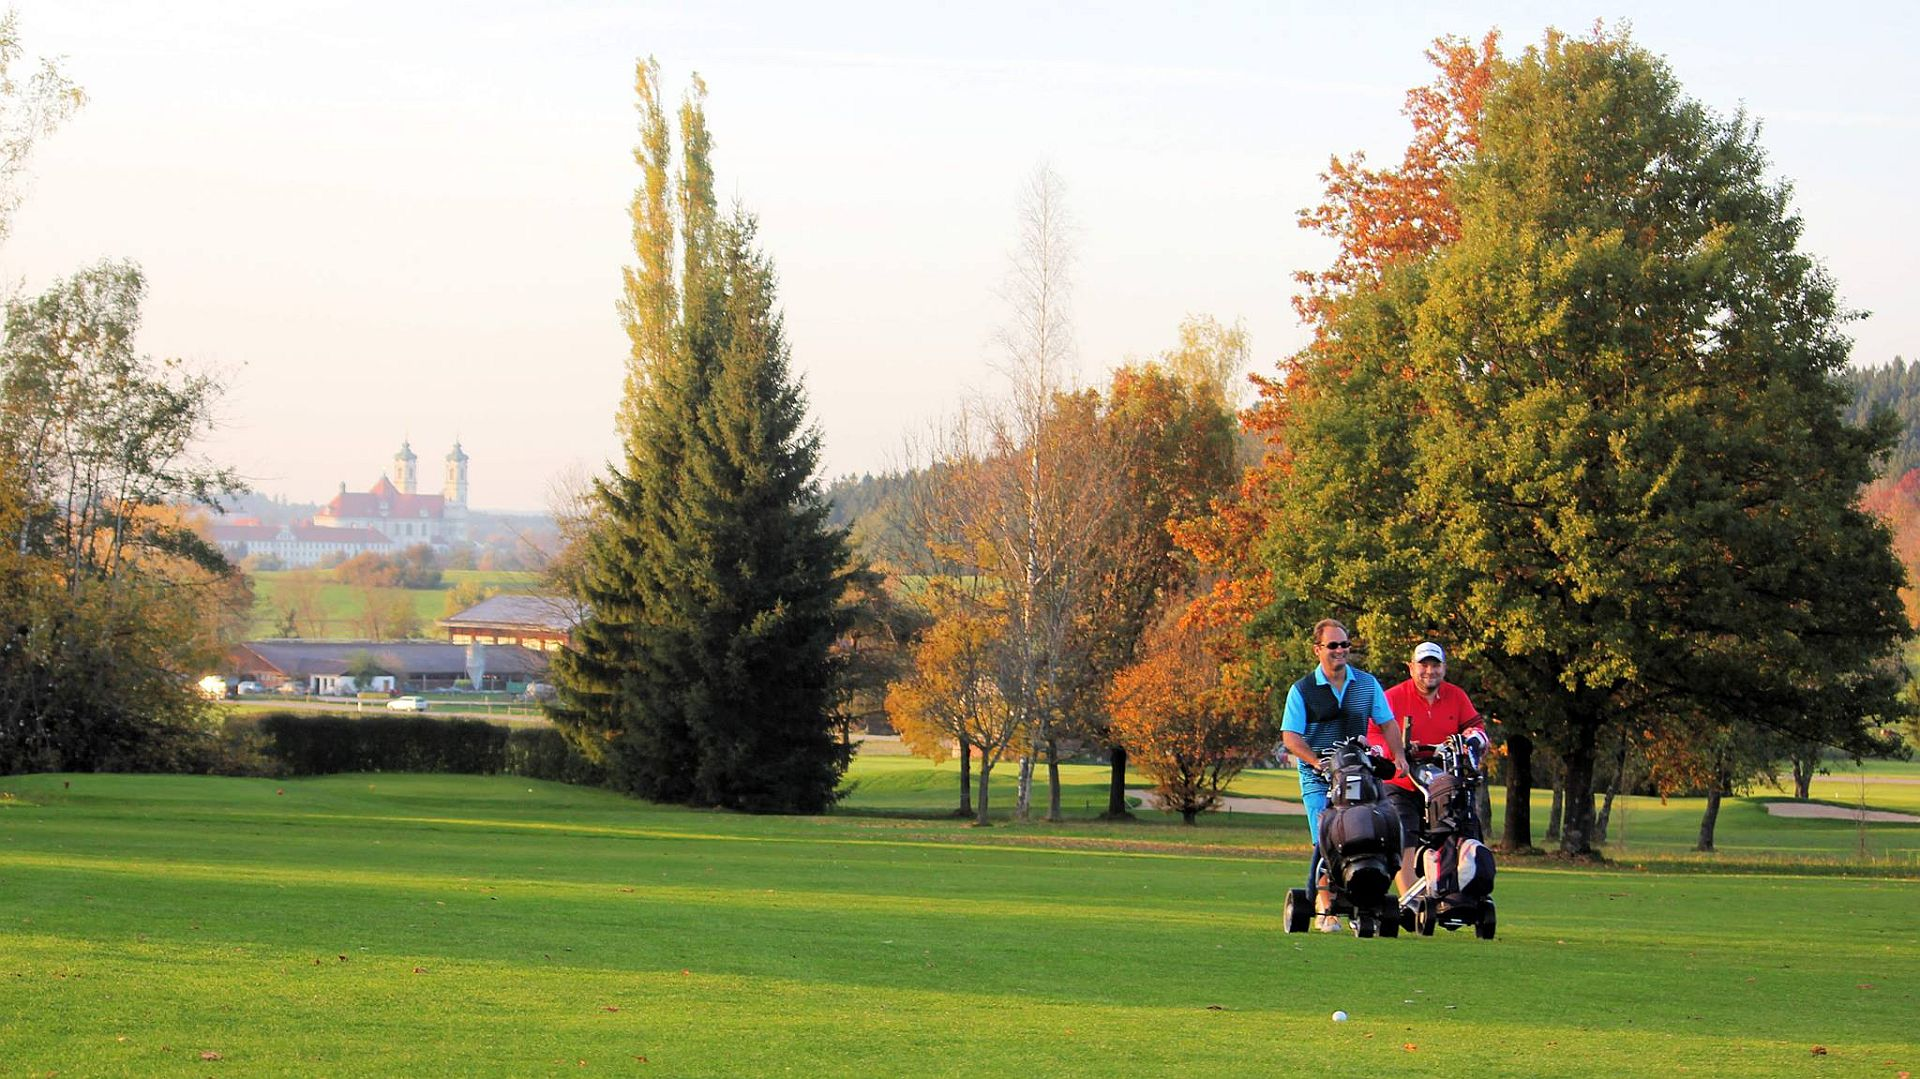 Allgäuer Golf- und Landclub, Bahn 9/Foto: Stephan Schöttl